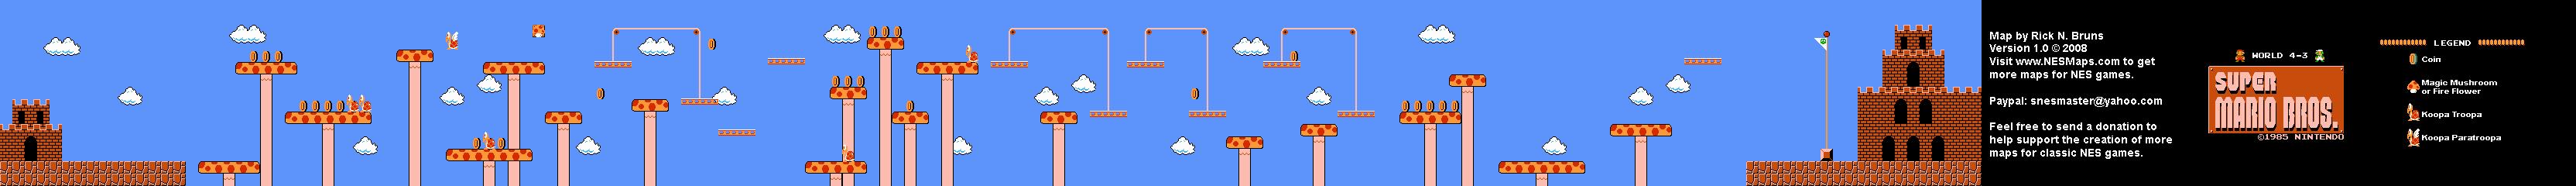 Super Mario Brothers World 4 3 Nintendo Nes Map